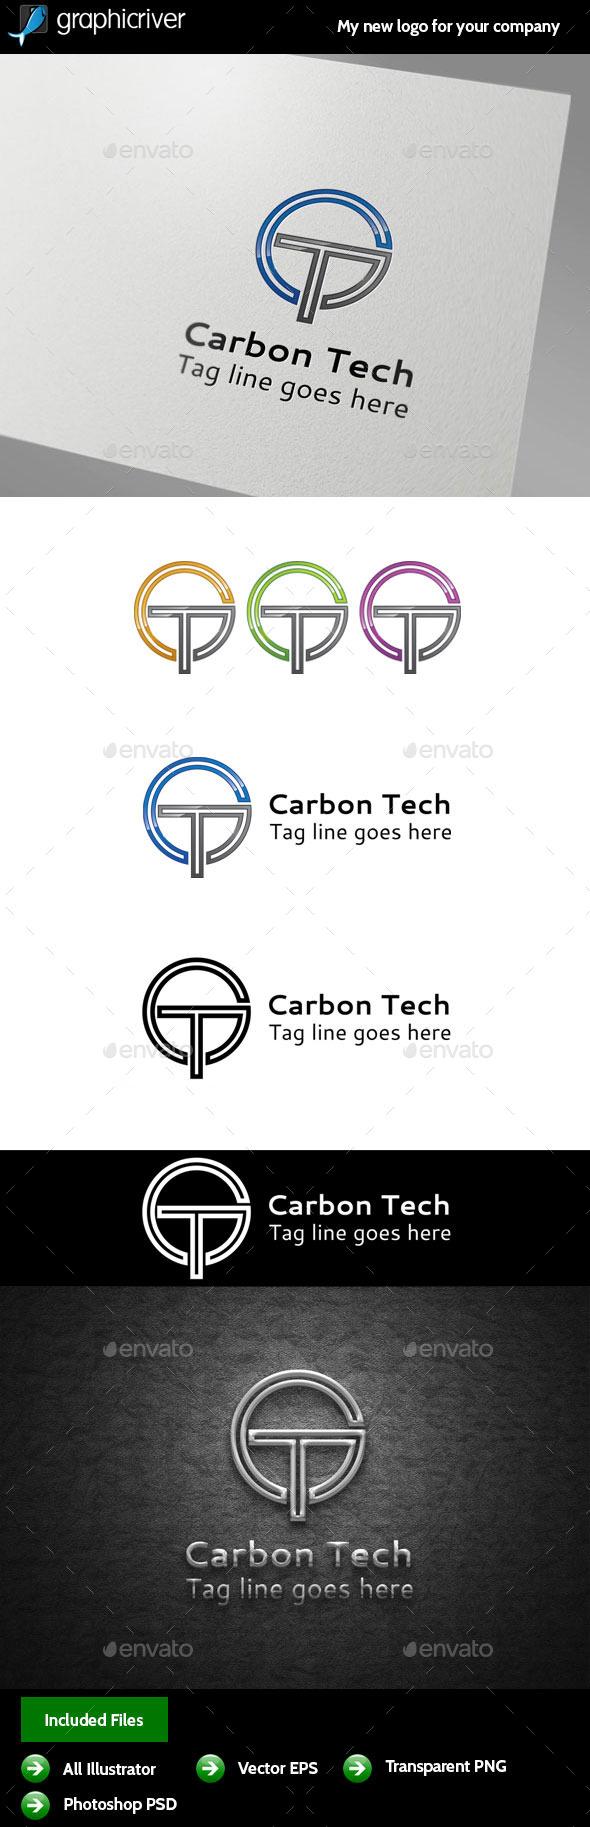 GraphicRiver Letter C & T logo 9950472